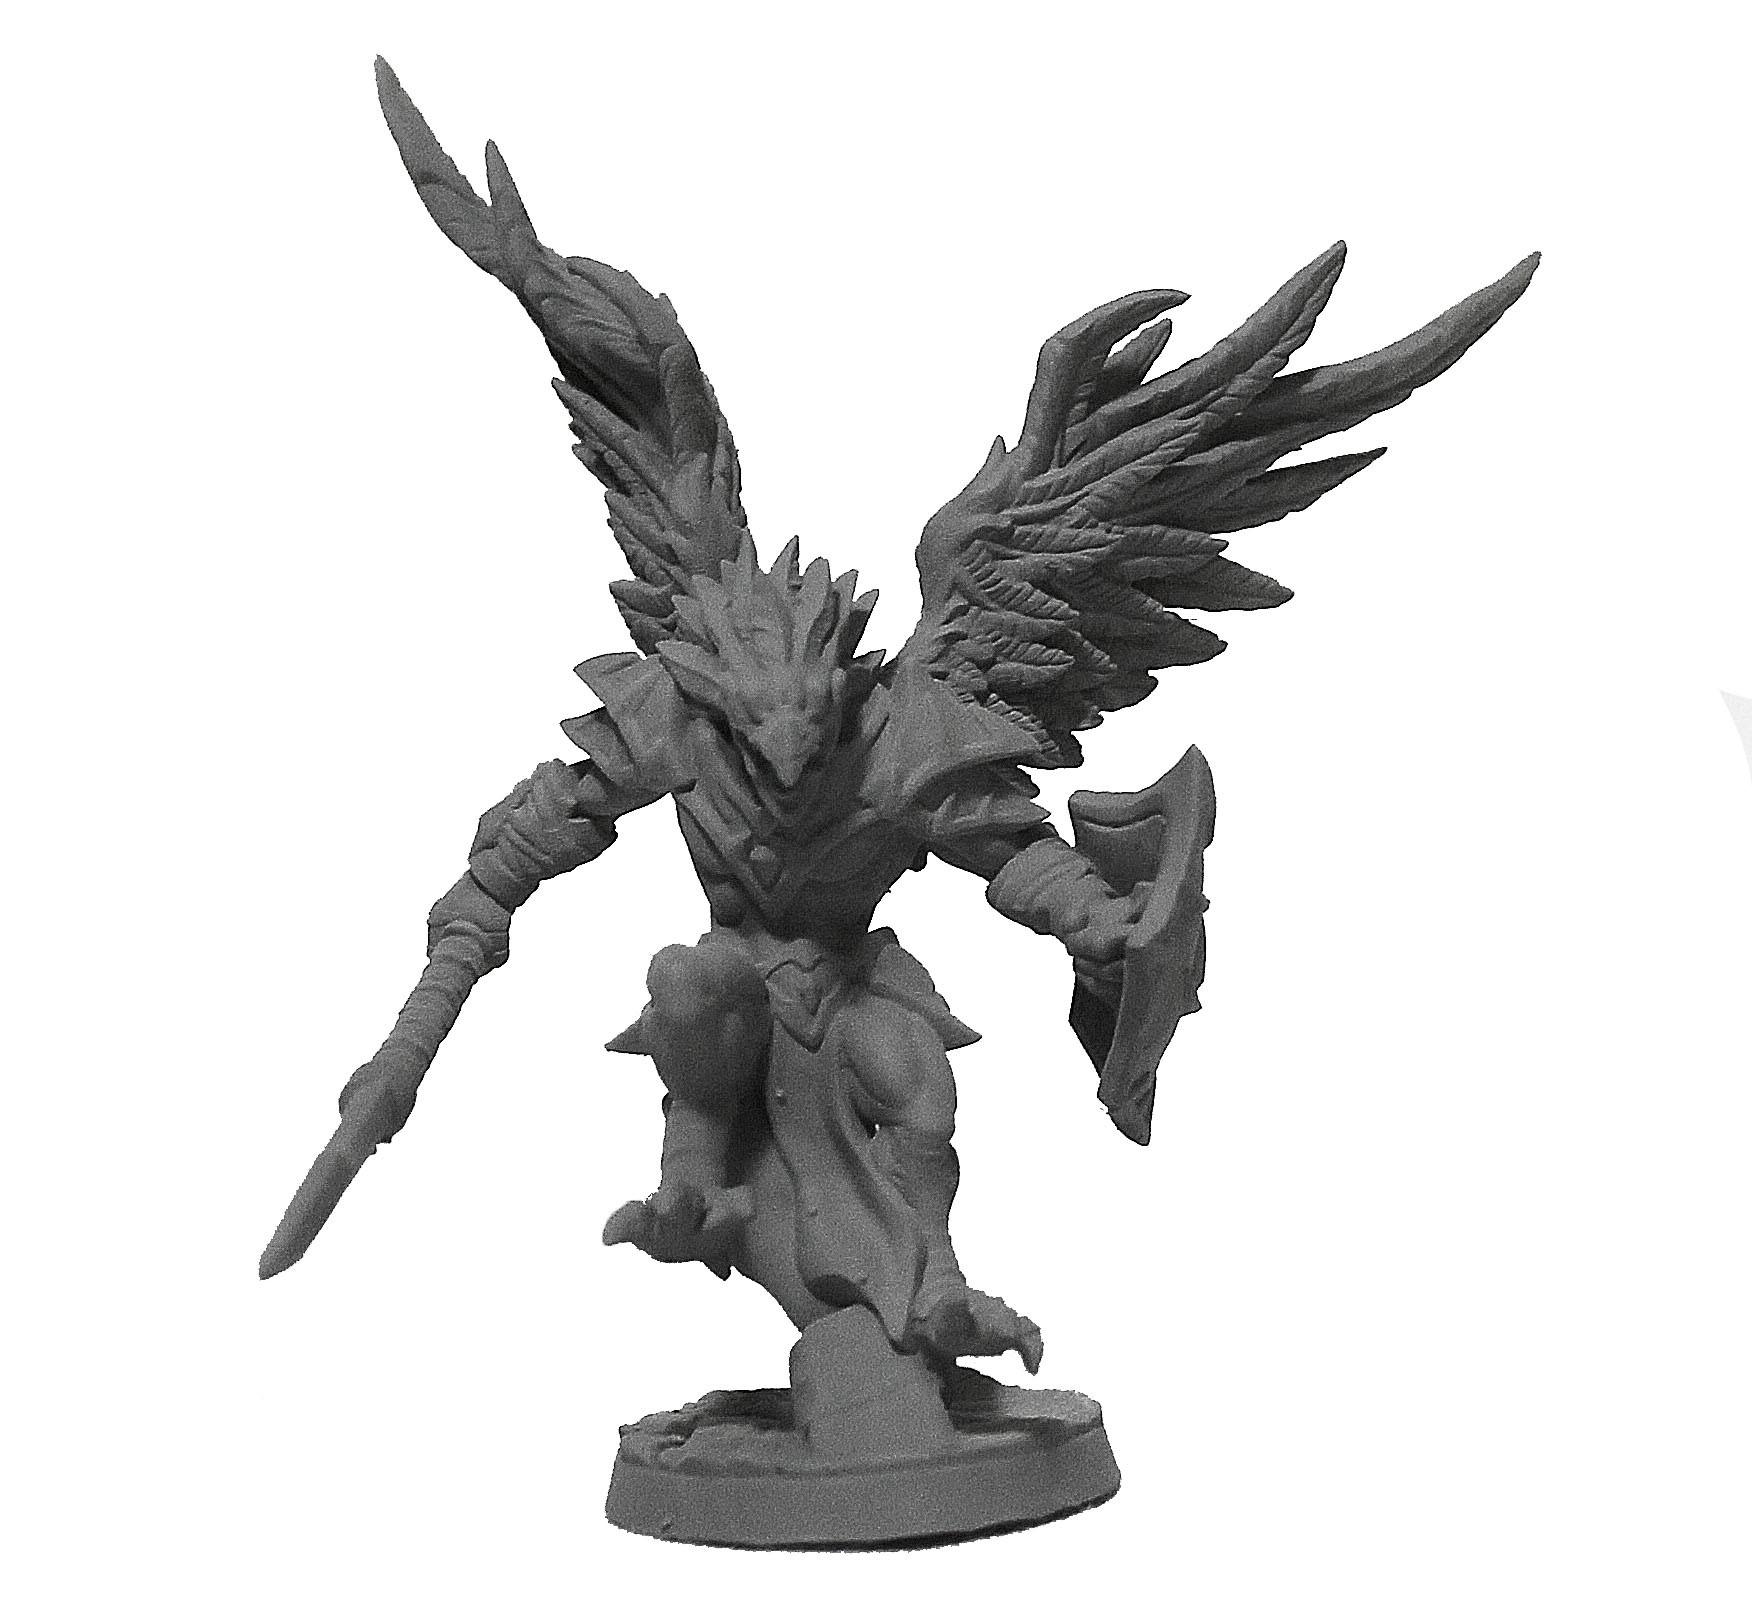 Homem Grifo Lança miniatura RPG Boargame Hobby pintura  - Dragon Store